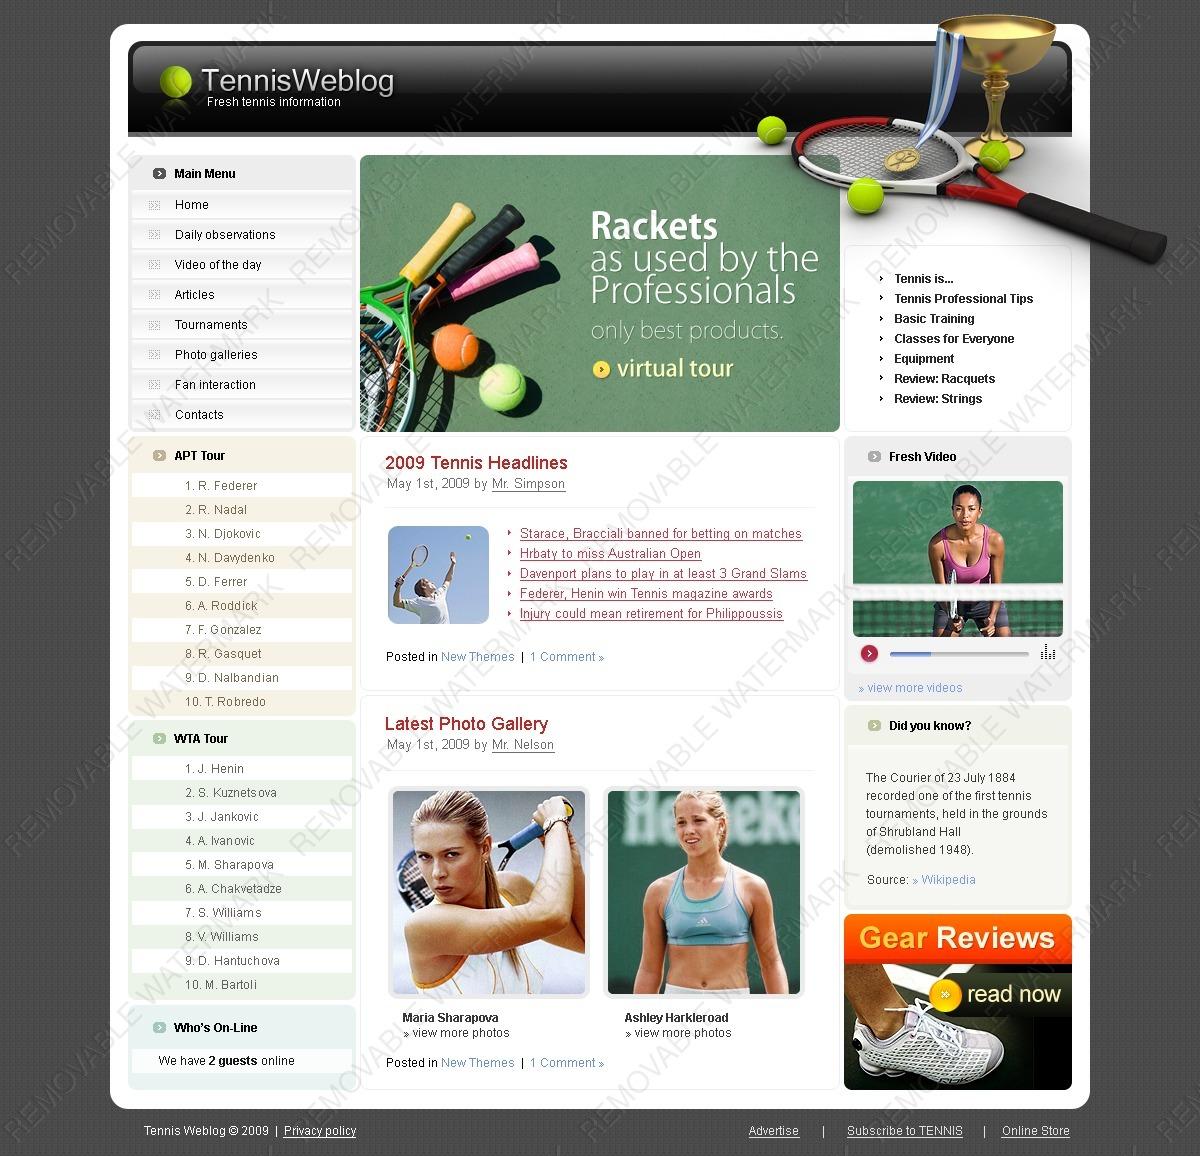 tennis website template 23660 by wt website templates. Black Bedroom Furniture Sets. Home Design Ideas